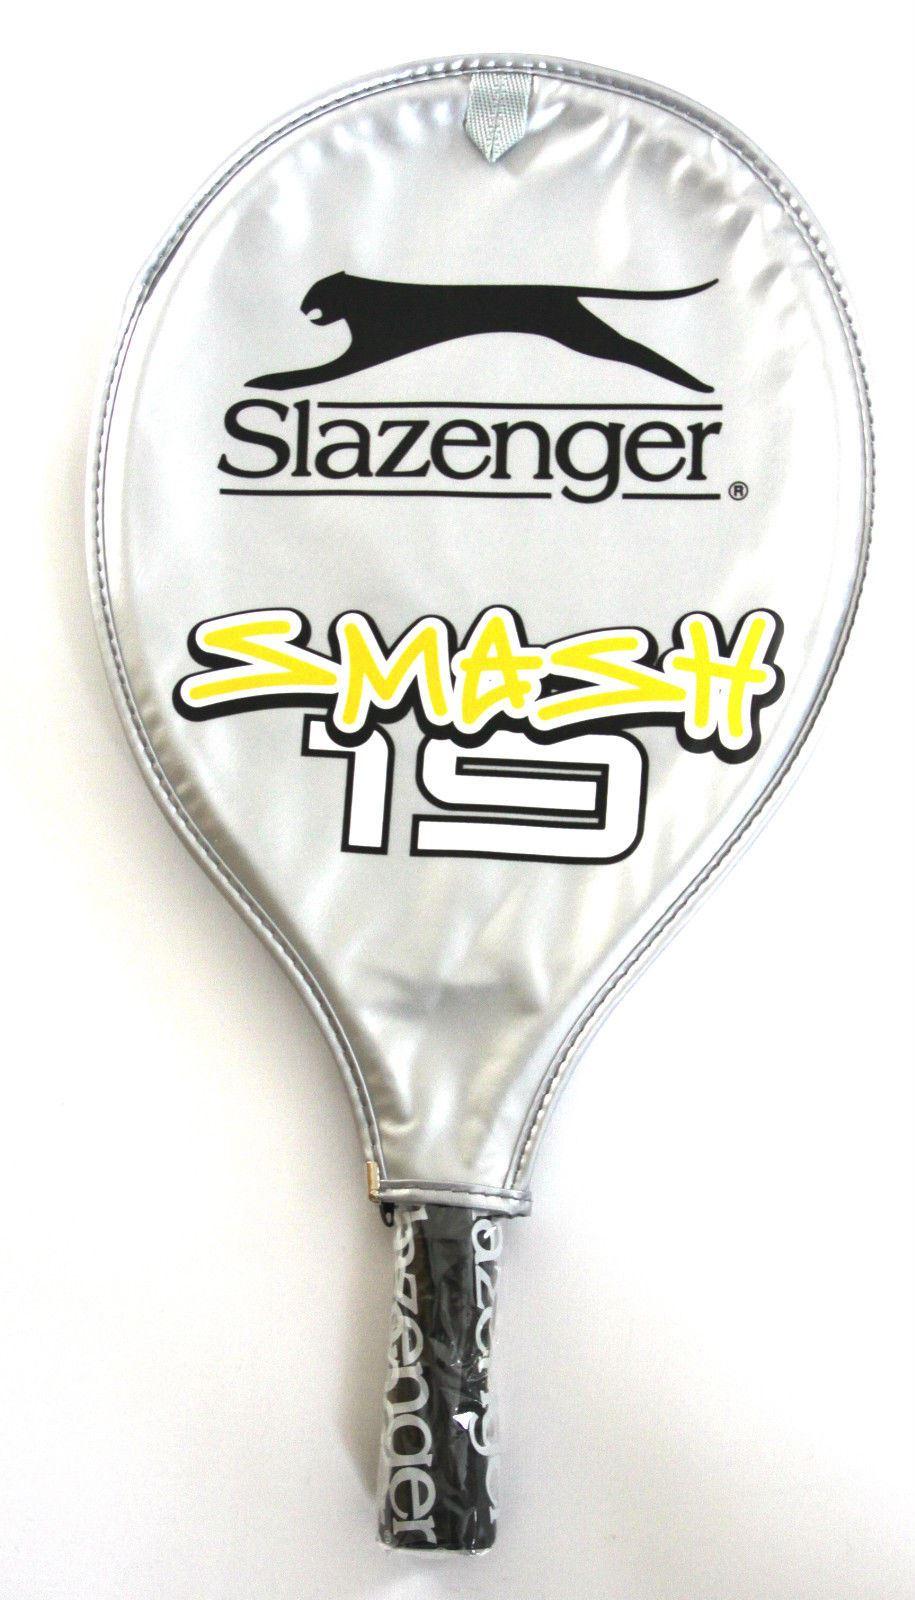 Smash 23 Slazenger Raquettes